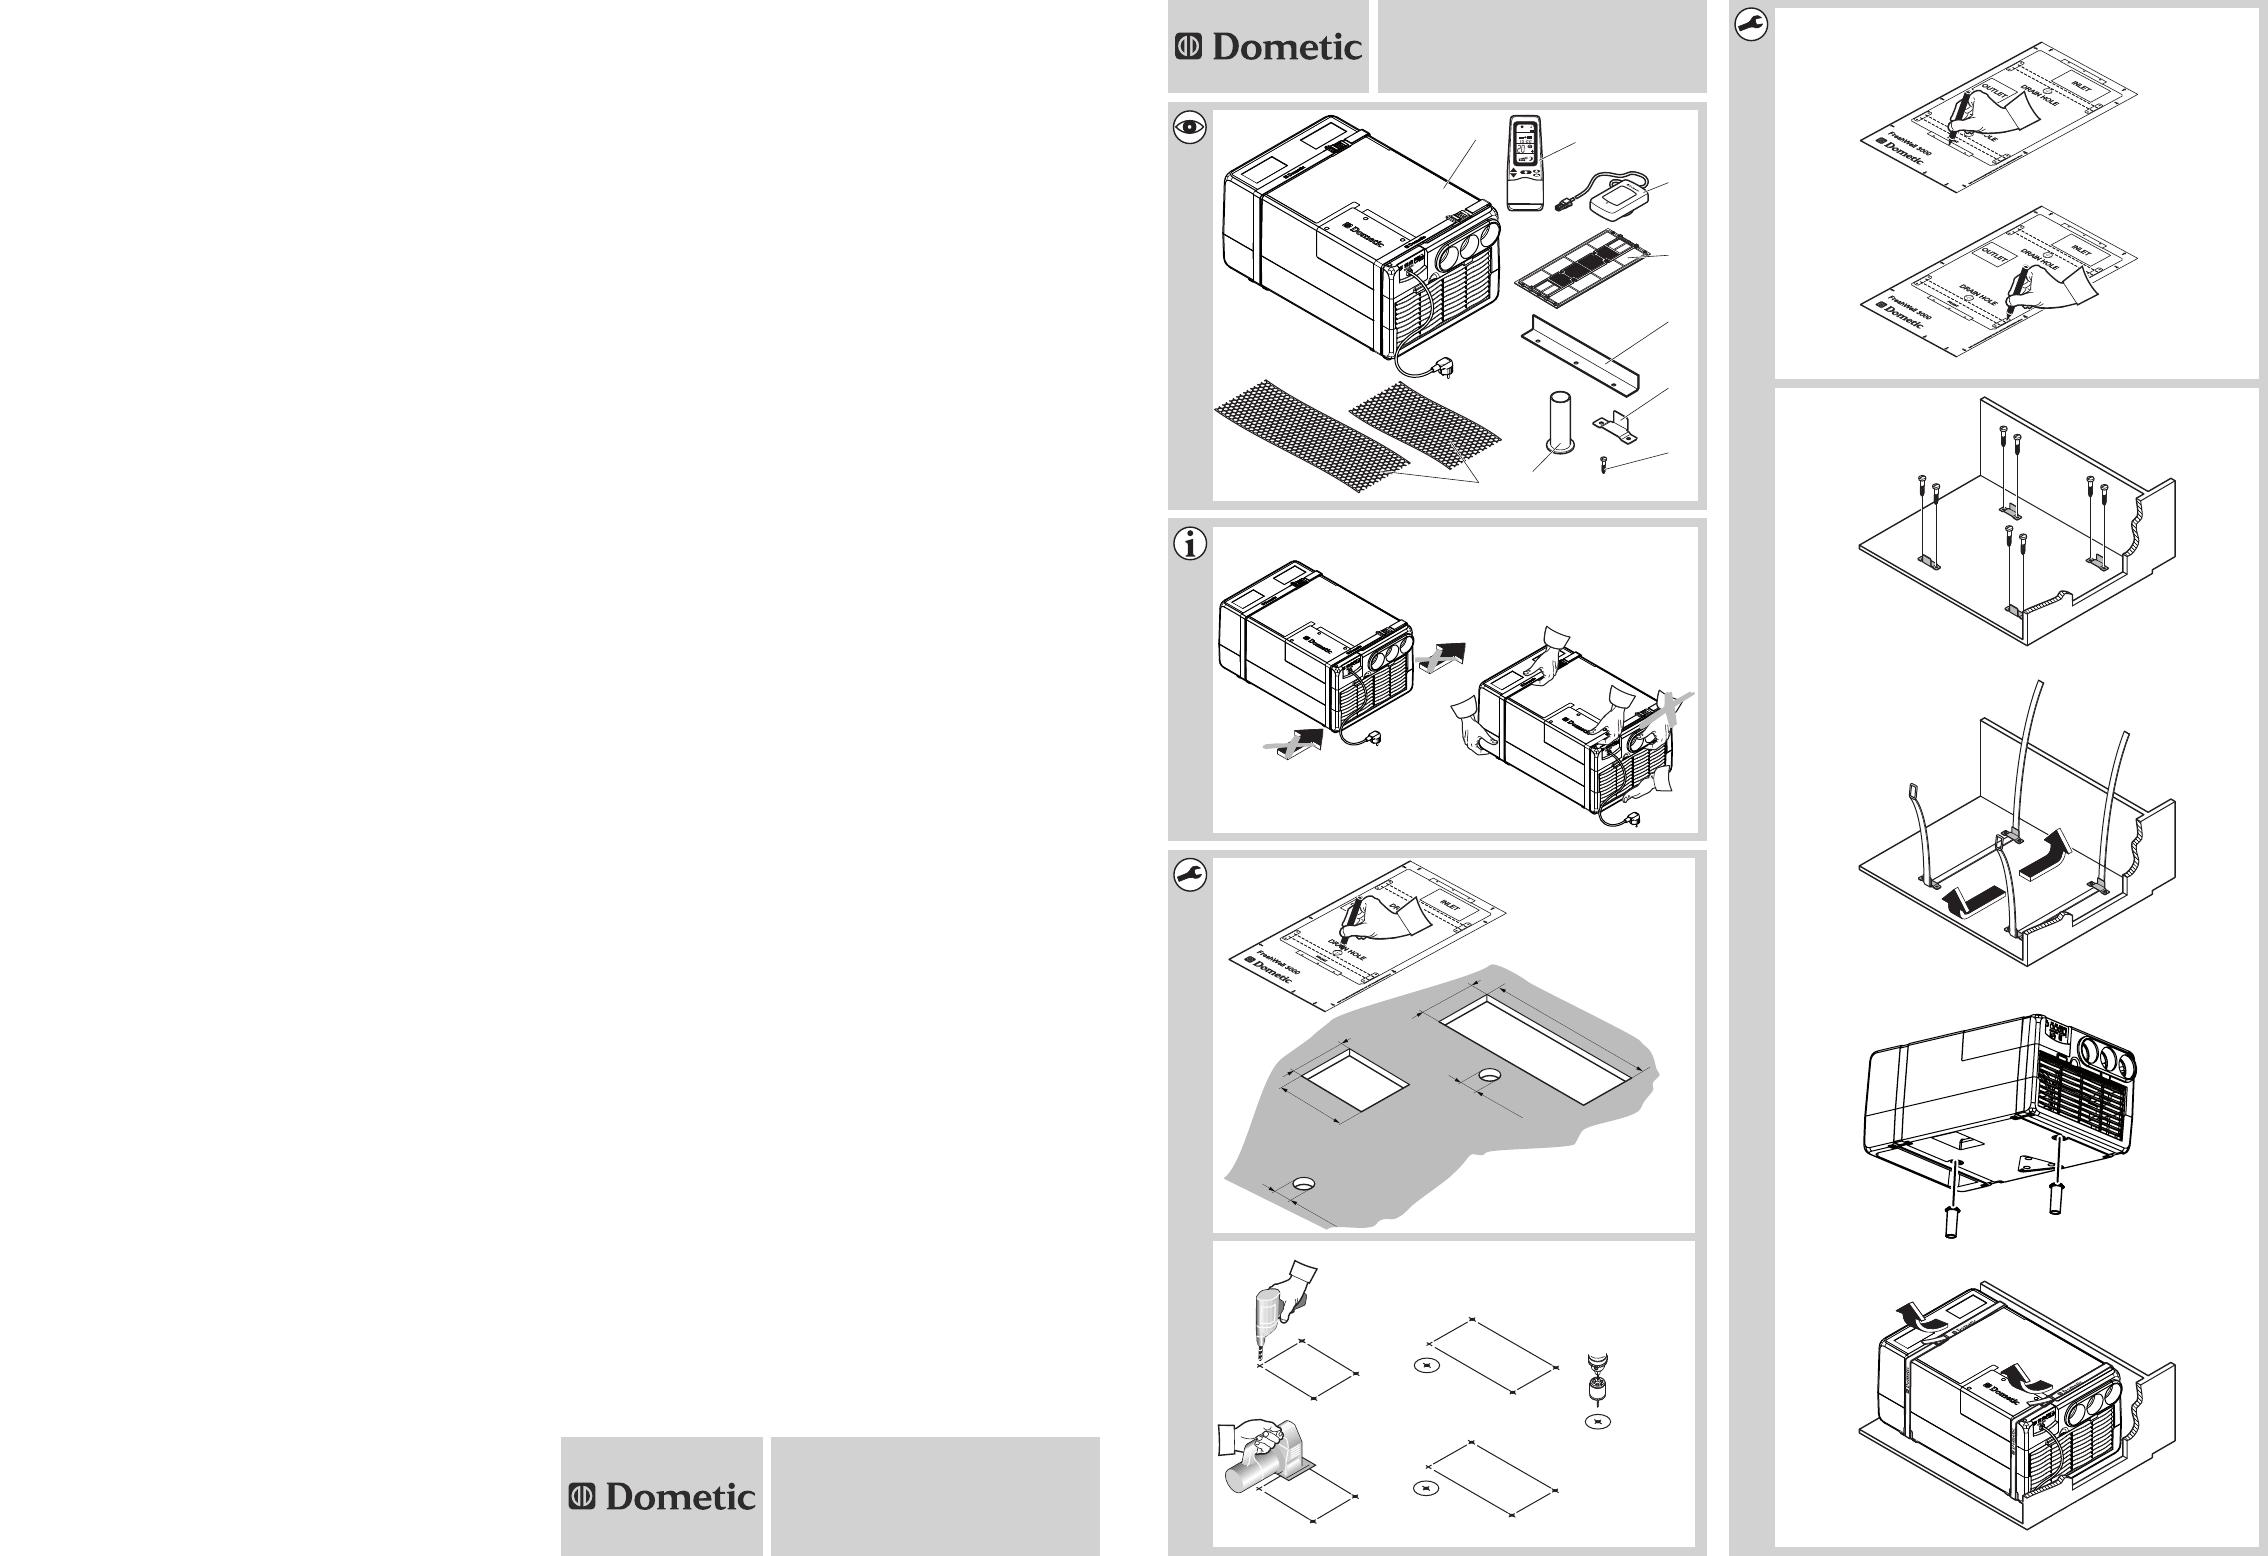 Handleiding Dometic FreshWell 3000 (pagina 1 van 262) (Alle talen) 937b1e53ece3